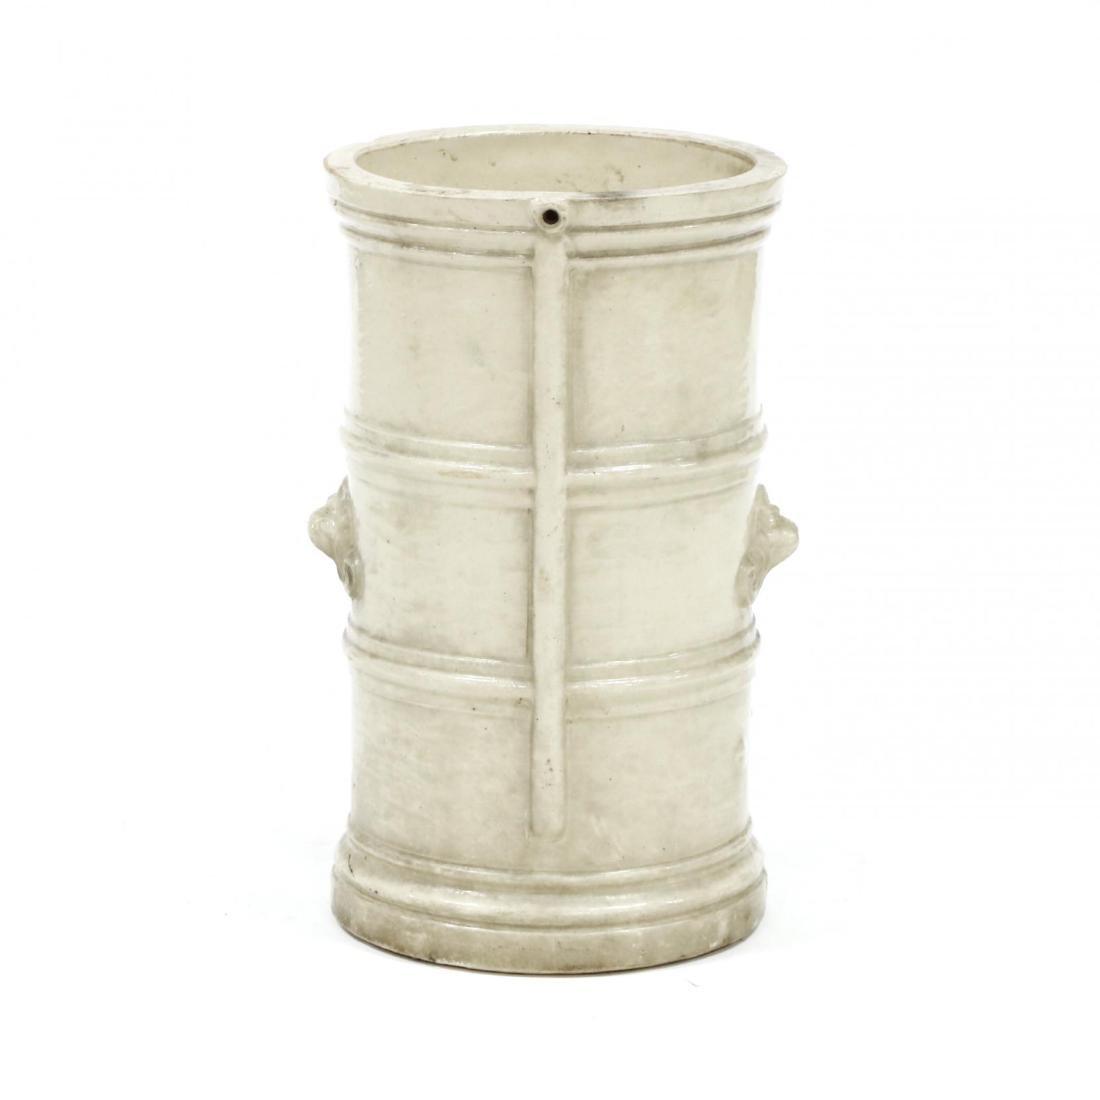 G. Cheavins, Antique English Stoneware Water Filter - 3